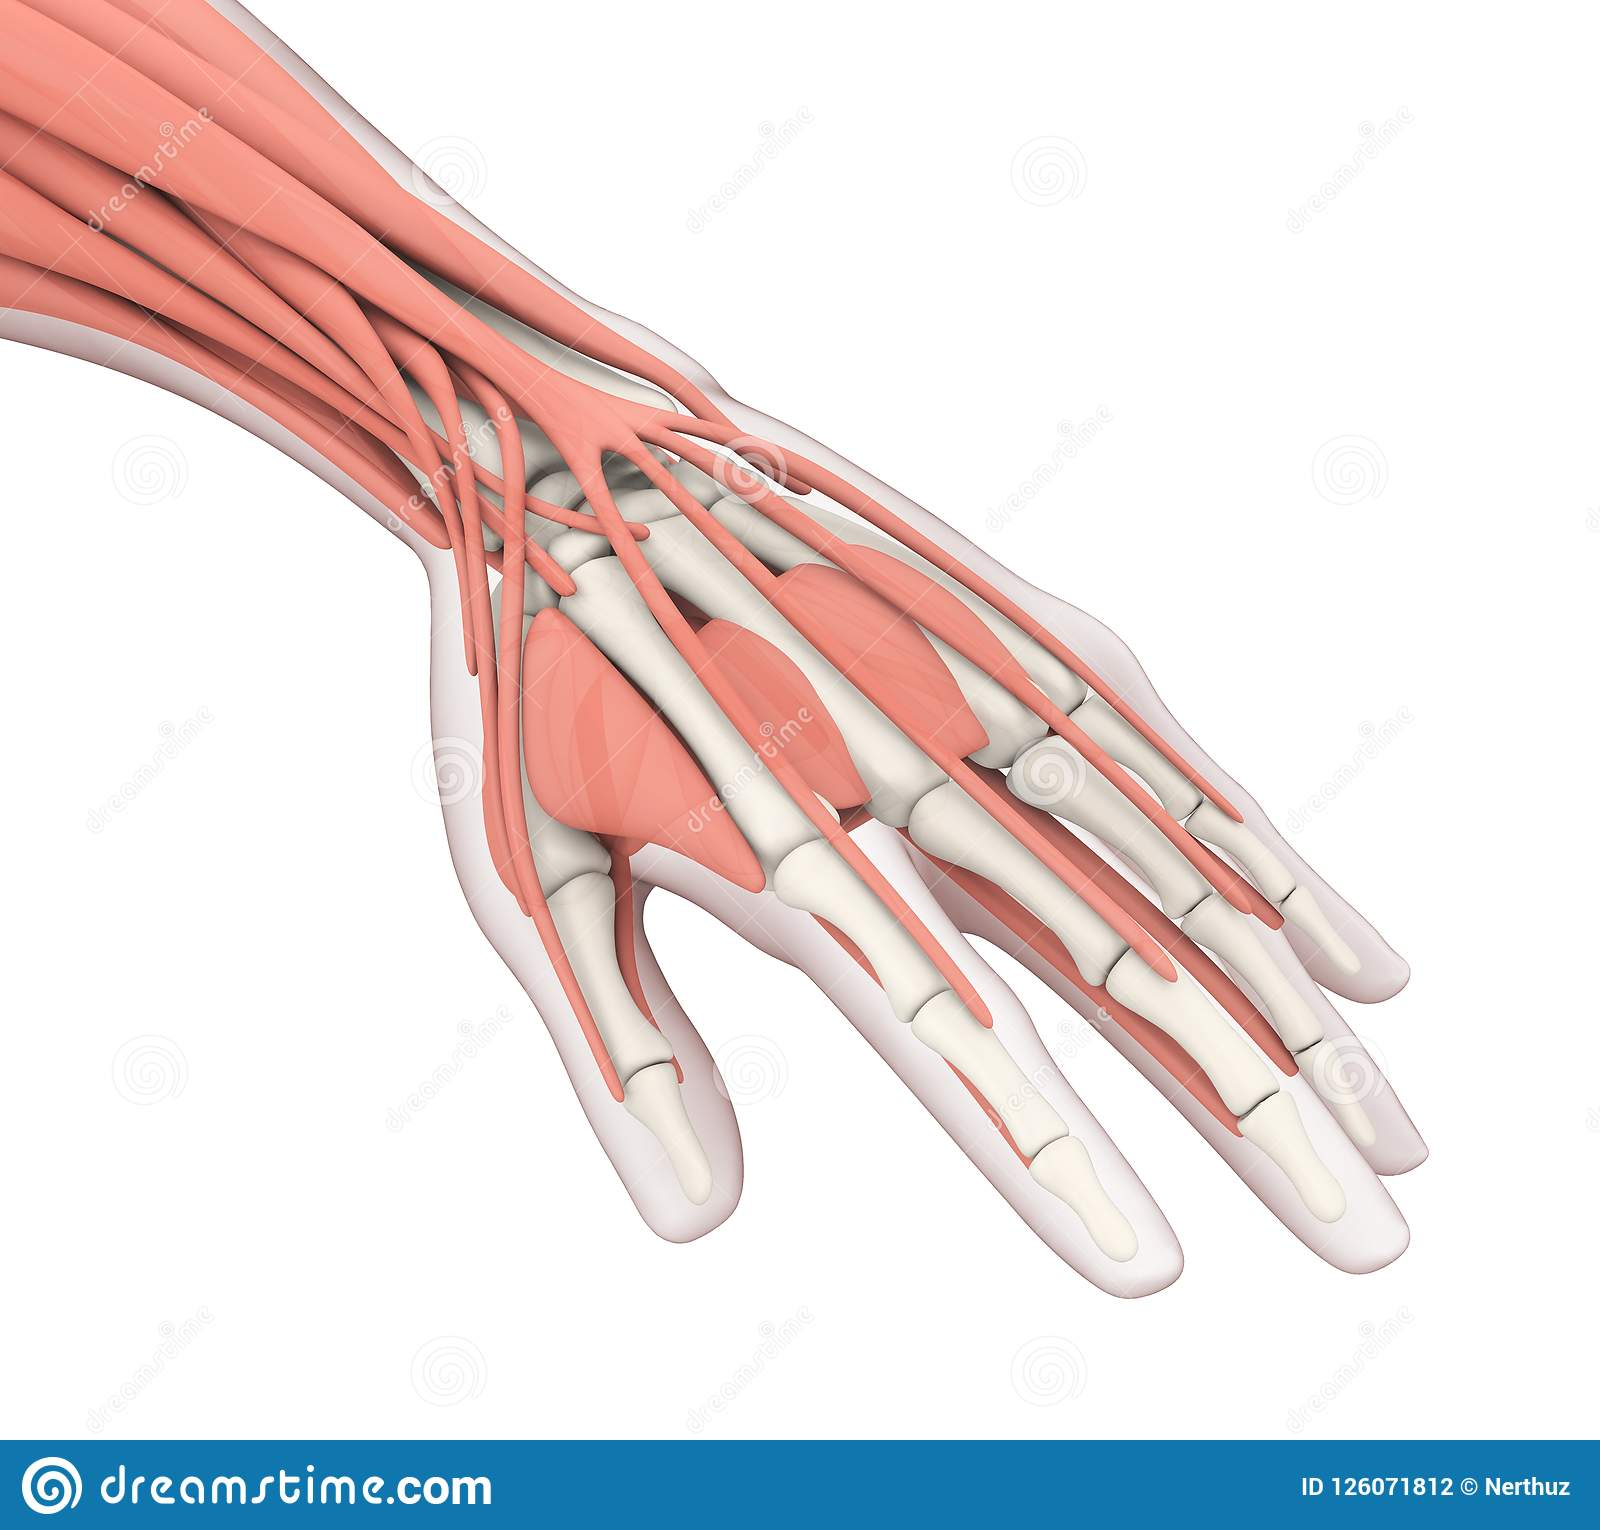 Human Hand Anatomy Illustration Stock Illustration Illustration Of